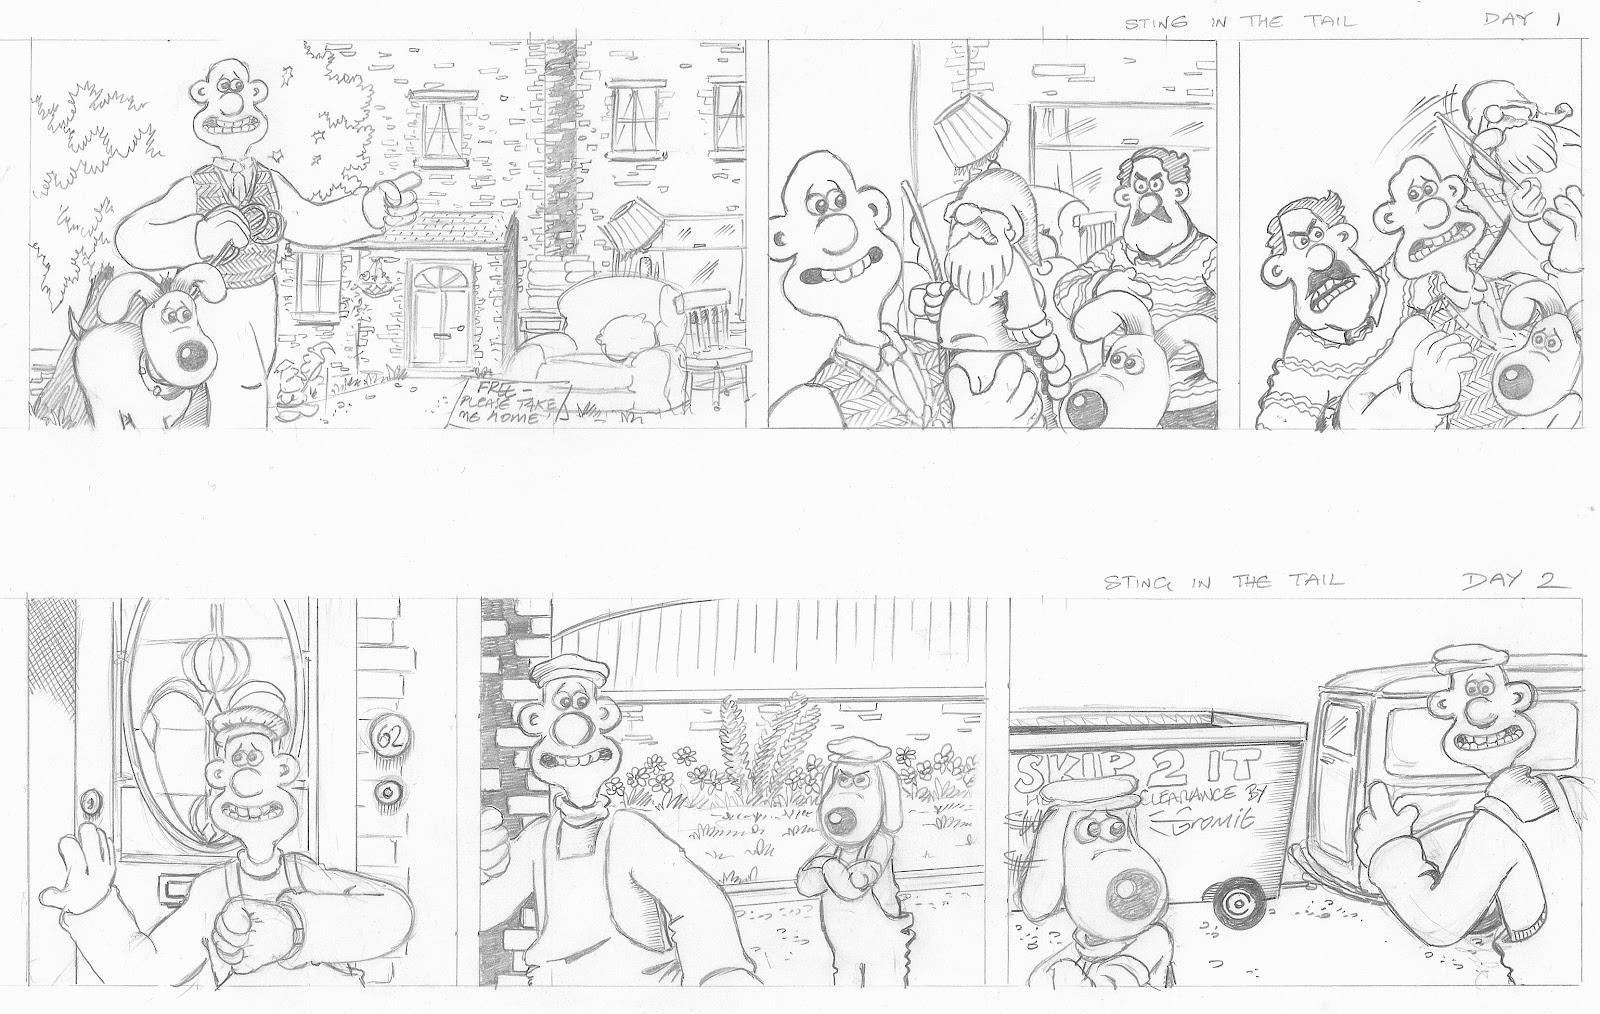 http://4.bp.blogspot.com/-IvZpsRKUu9k/T6Jv9zsBKFI/AAAAAAAABgg/os2nupbv_D4/s1600/W&G+Sting+In+The+Tail++pencils+Day+1+and+20001.jpg